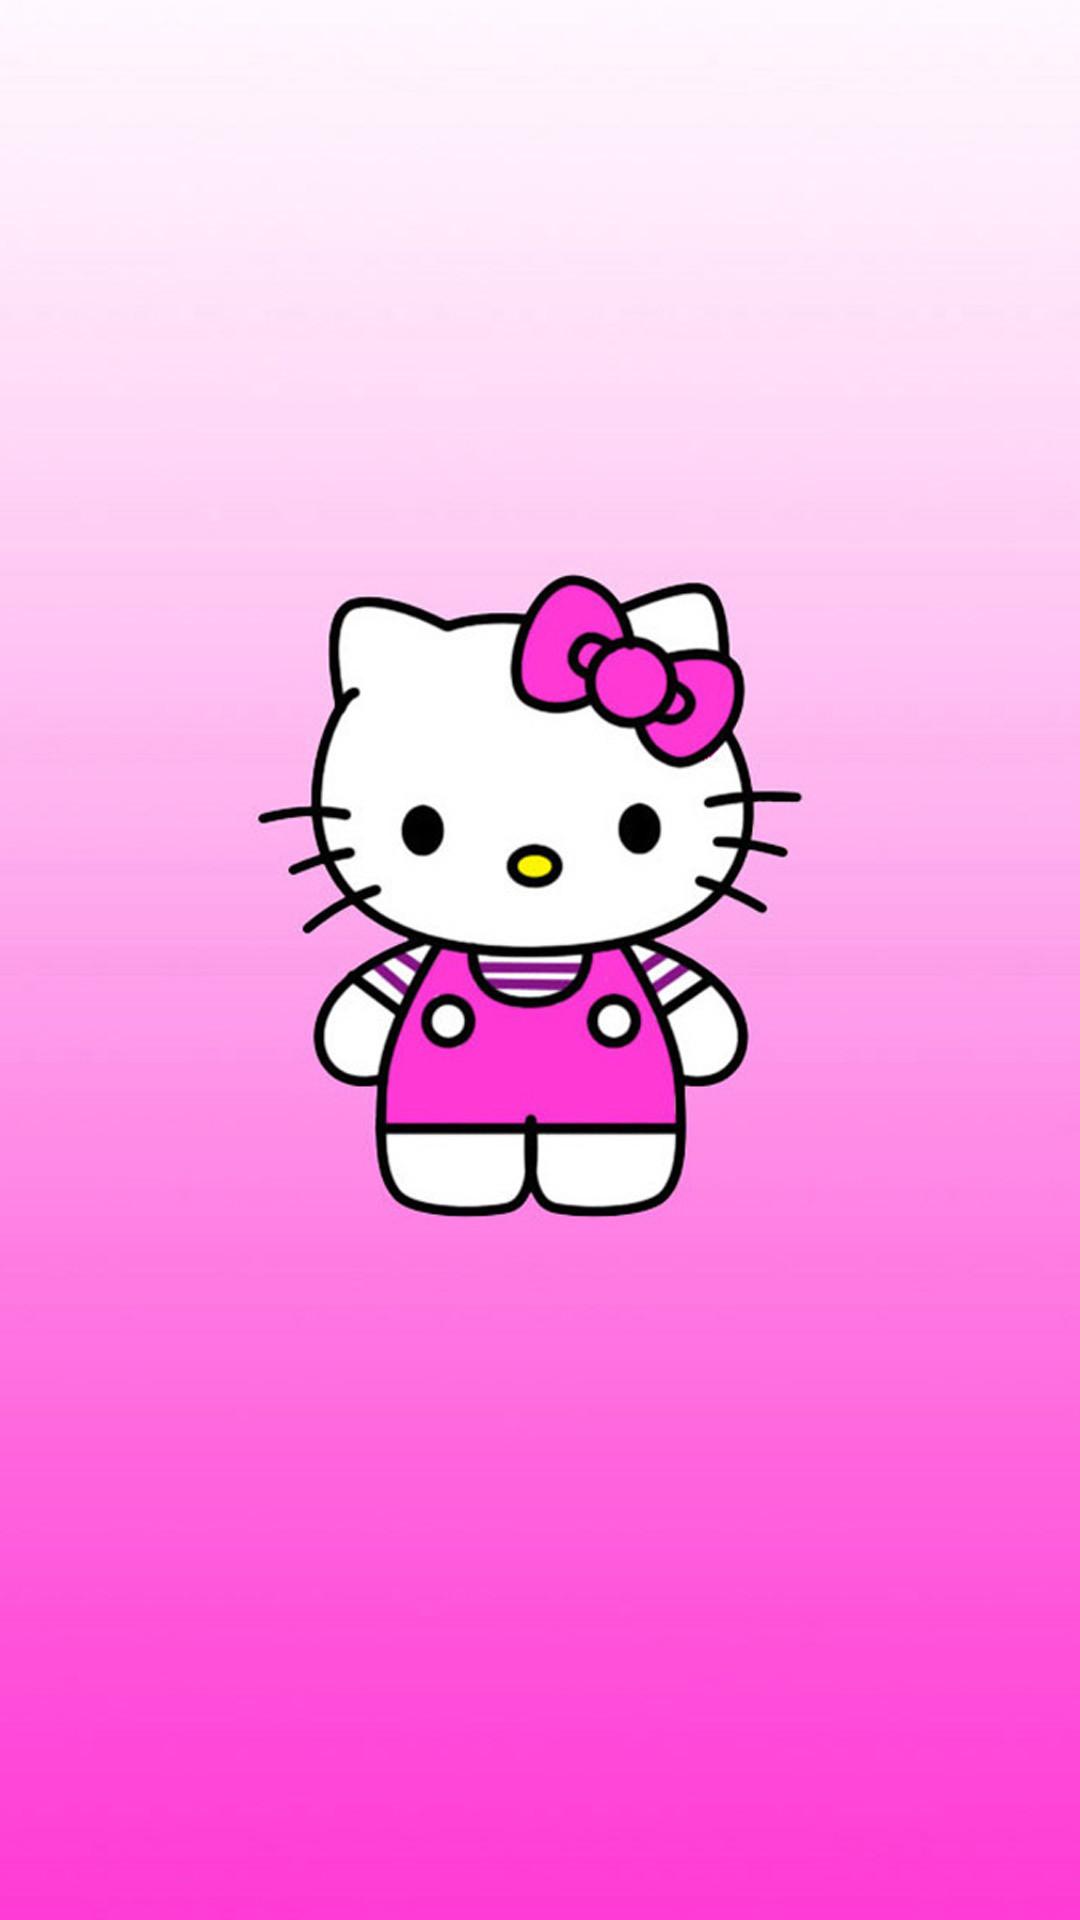 Hello Kitty Wallpaper For Desktop 62 Pictures